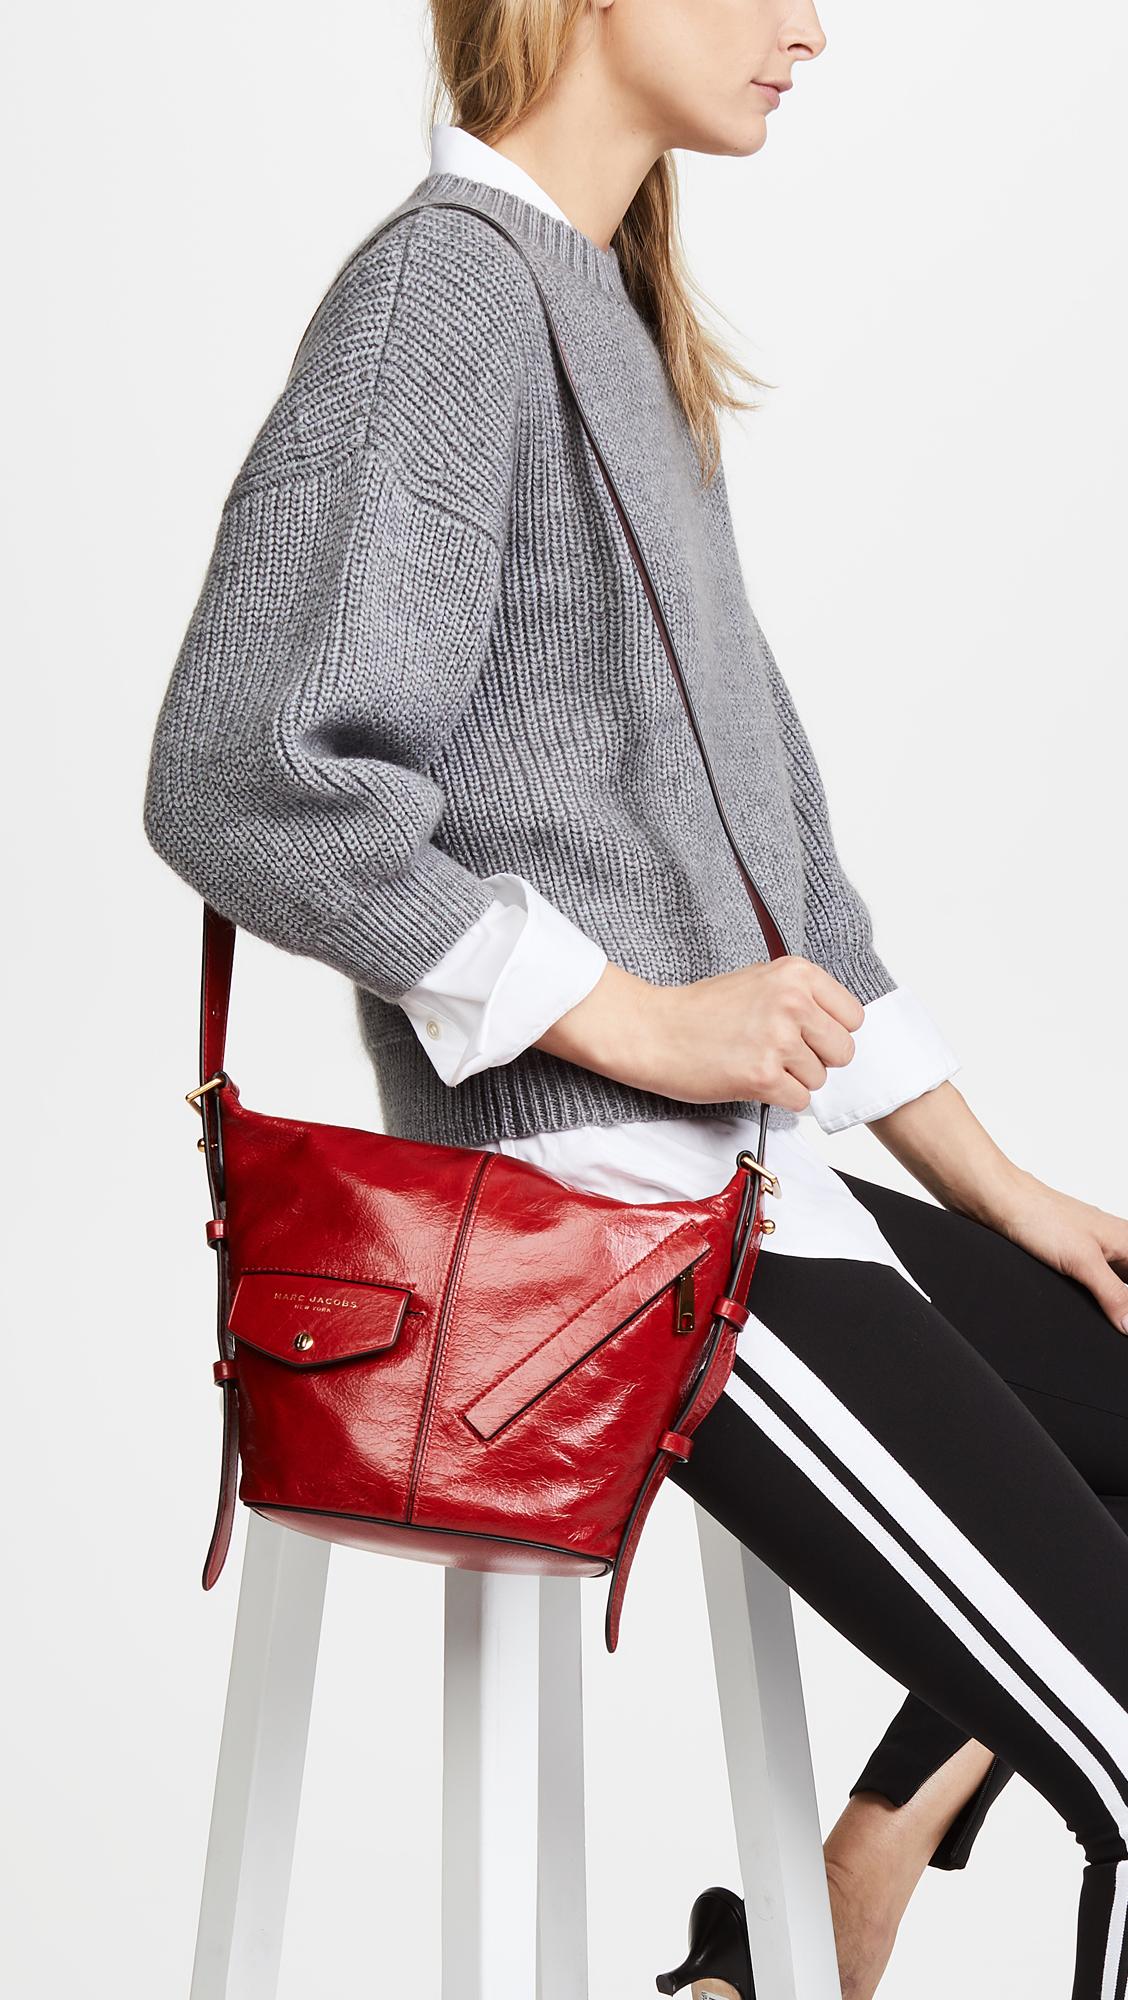 b002f06aca Marc Jacobs The Mini Sling Bag